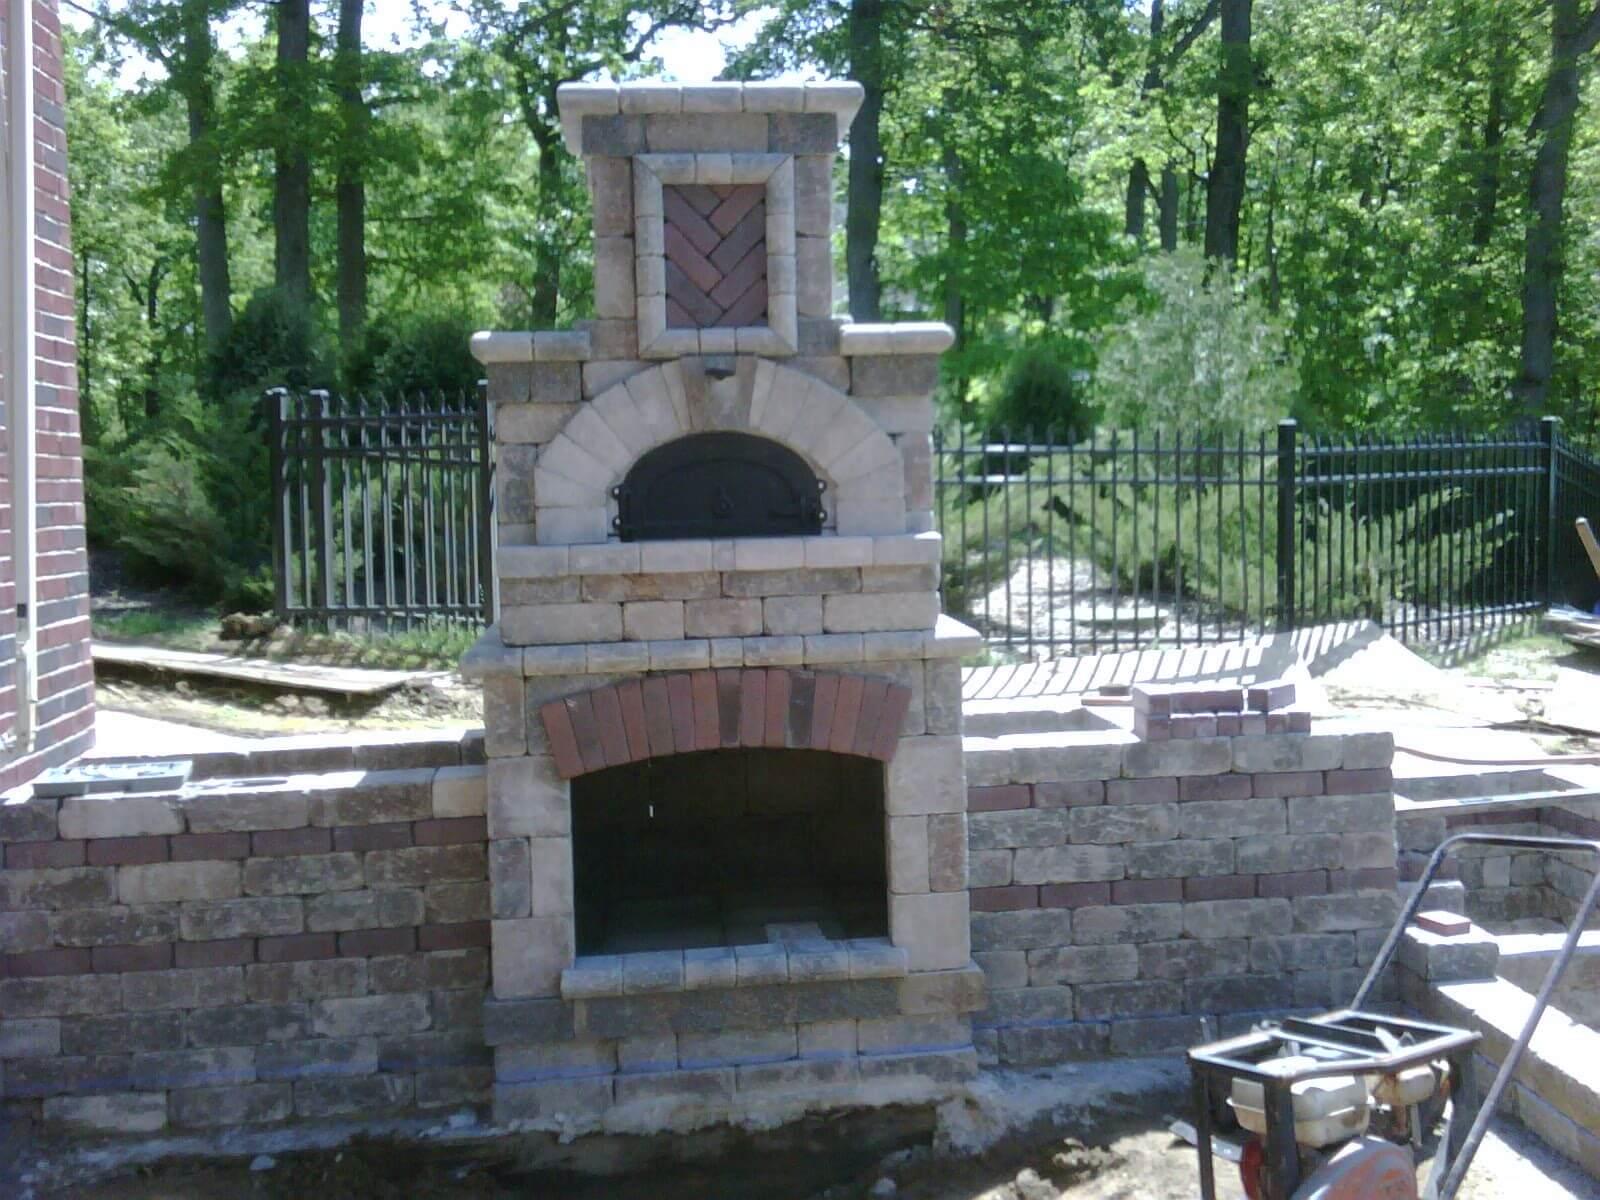 Tuscany Brick Oven.jpg